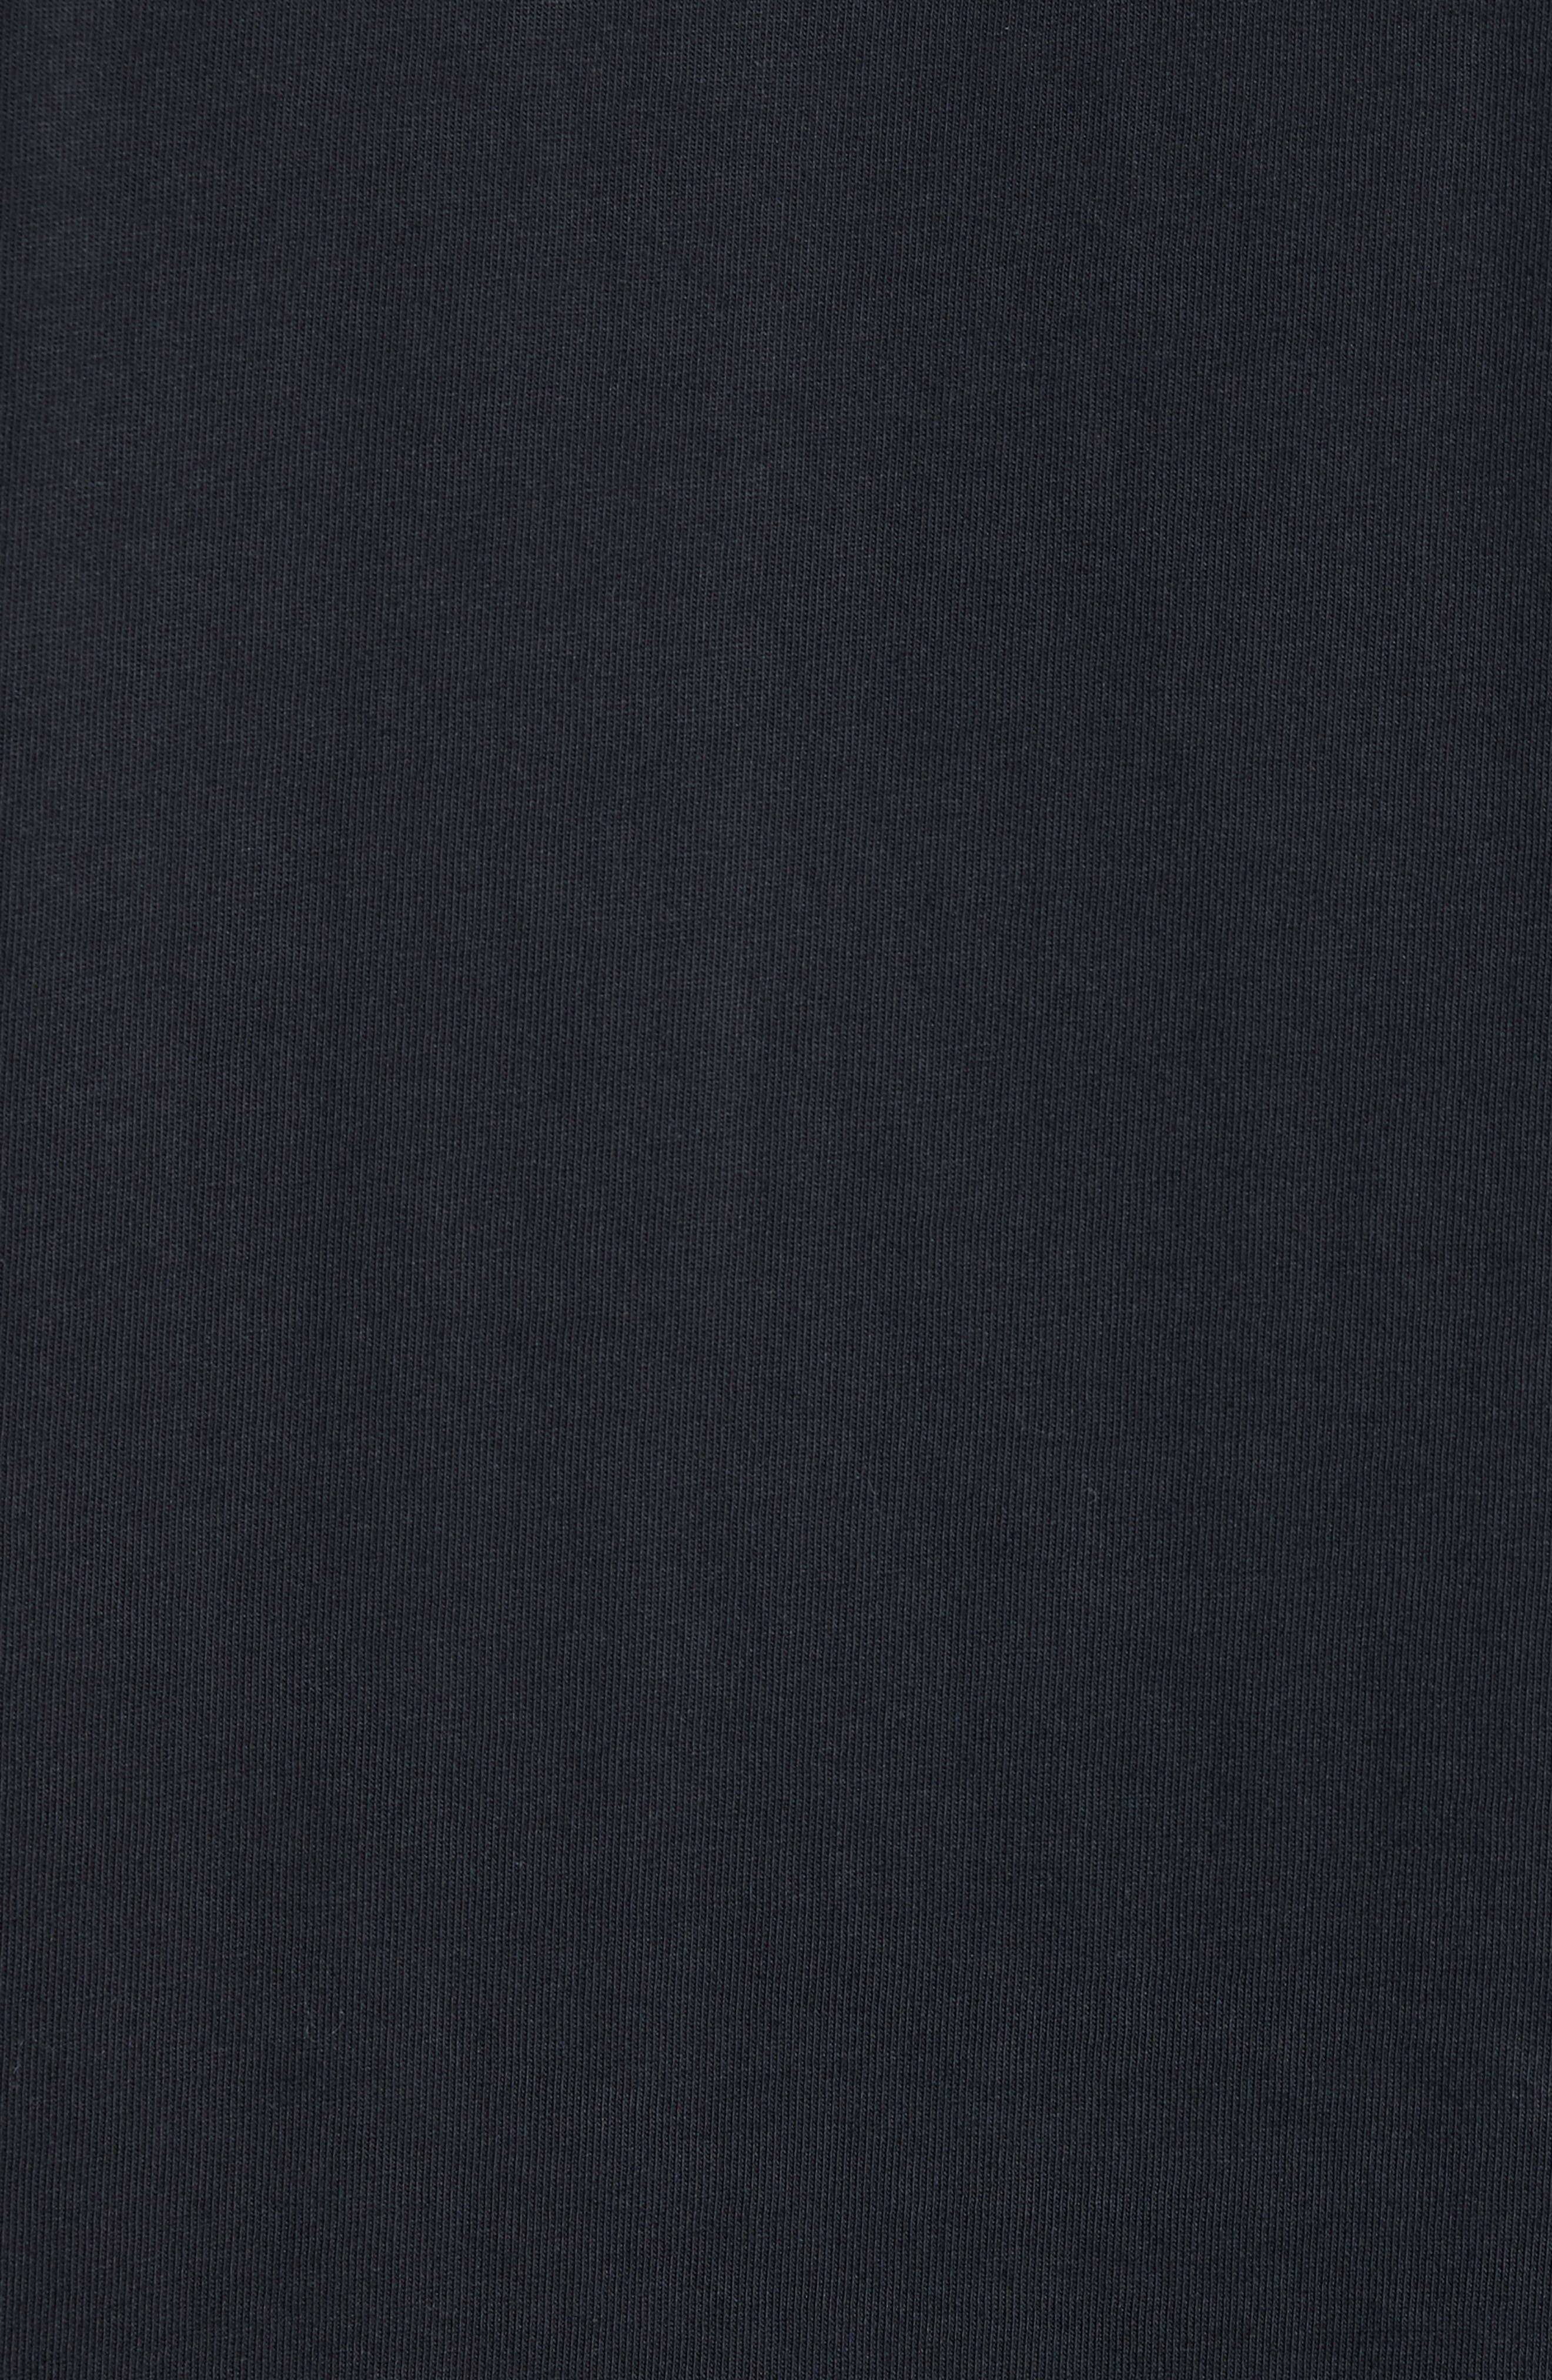 Japan Graphic T-Shirt,                             Alternate thumbnail 5, color,                             Black